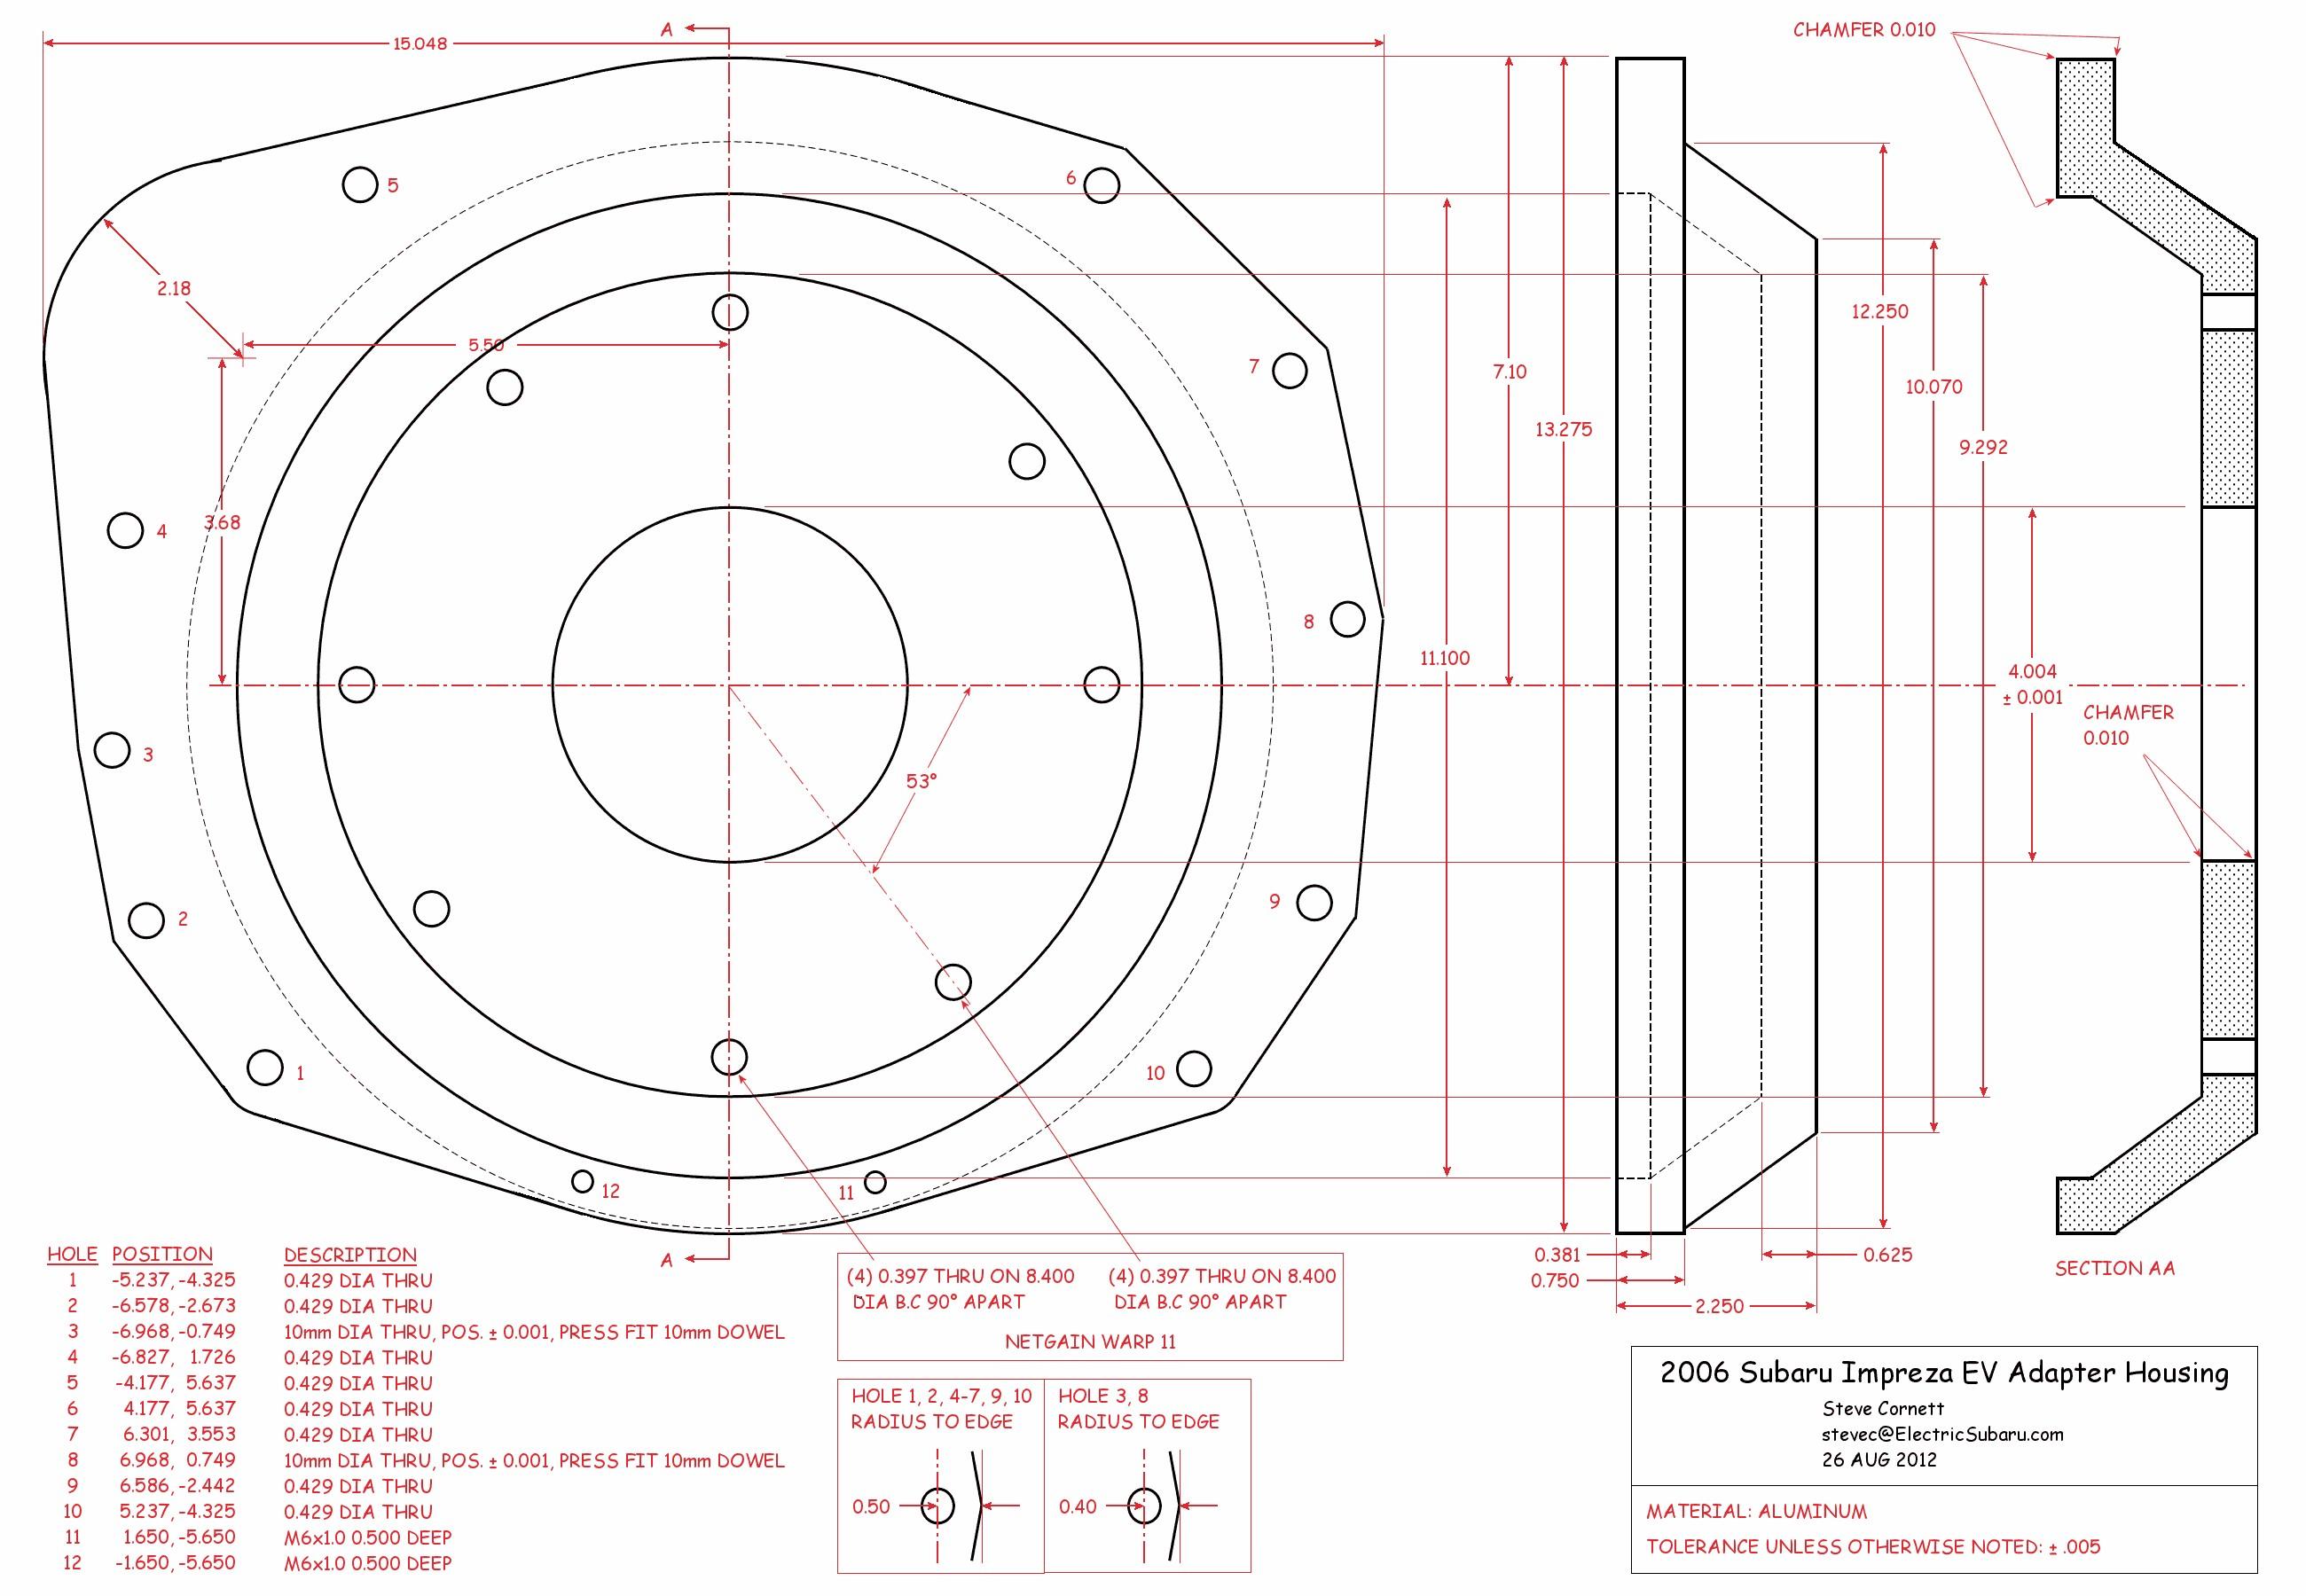 Diagram Of Car Gearbox Pin by Rodrigo Passos On Gearbox Of Diagram Of Car Gearbox